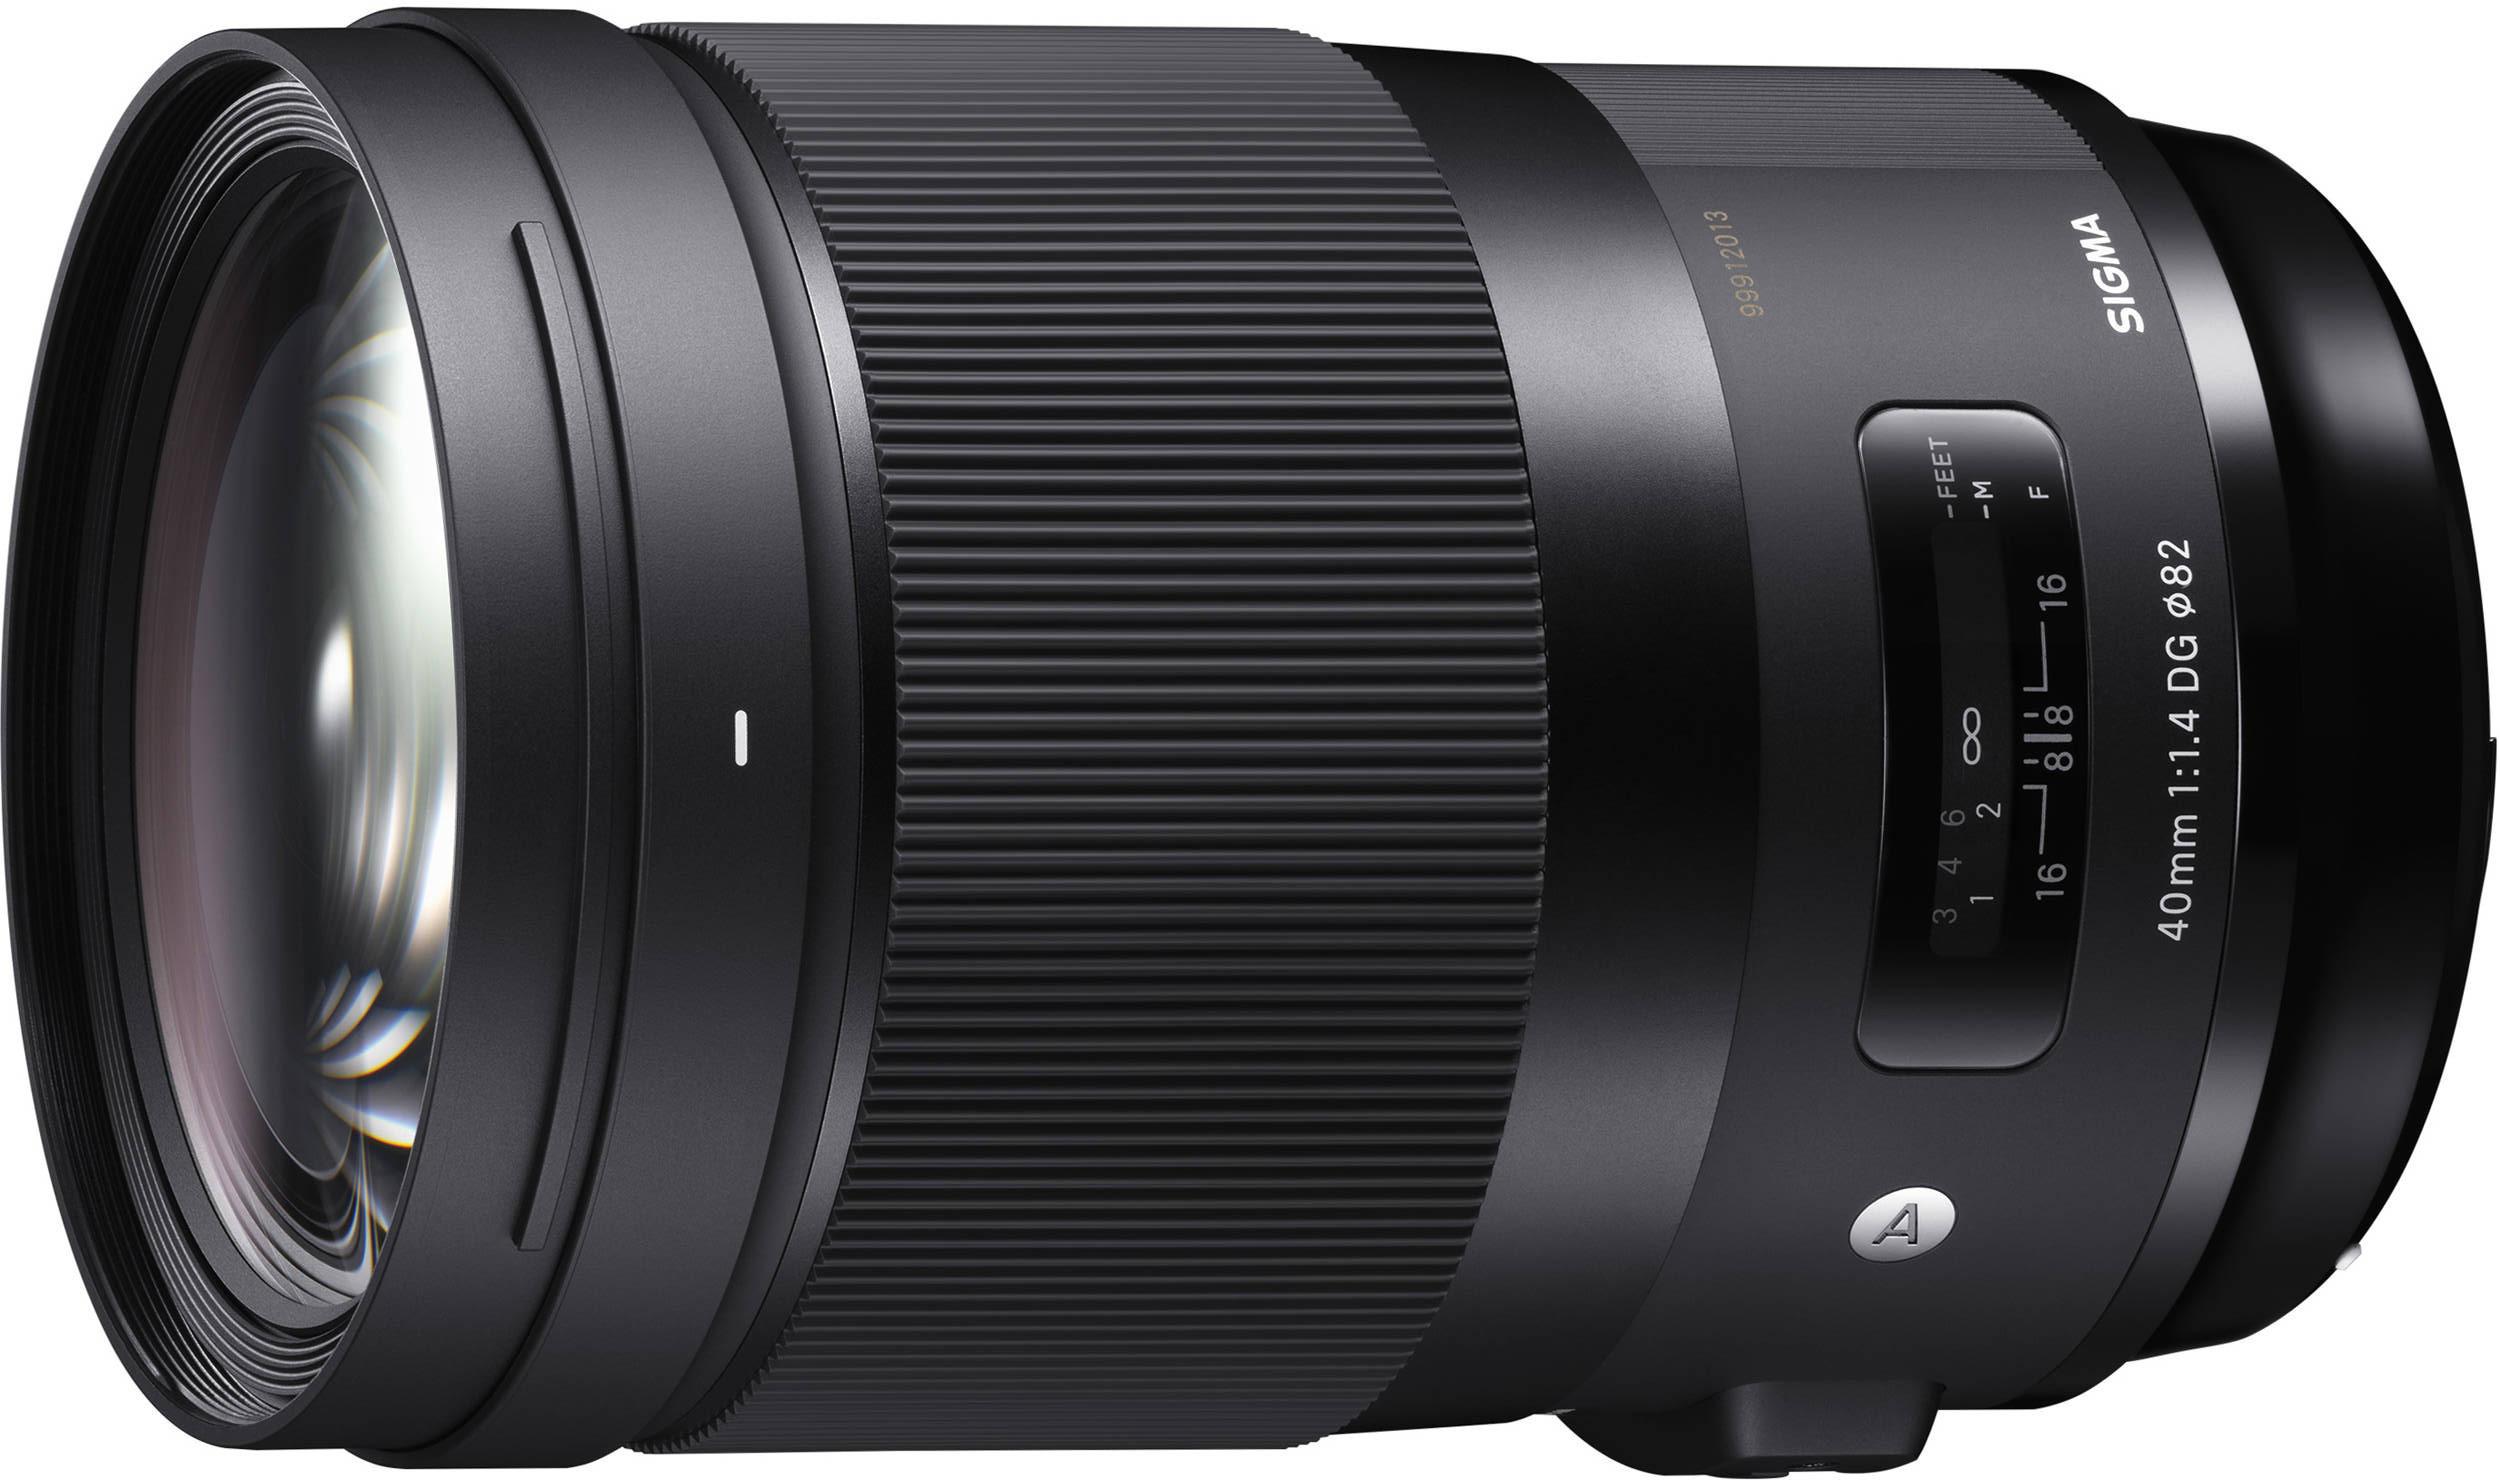 Sigma 40mm f/1.4 DG HSM Art objektiiv Nikonile